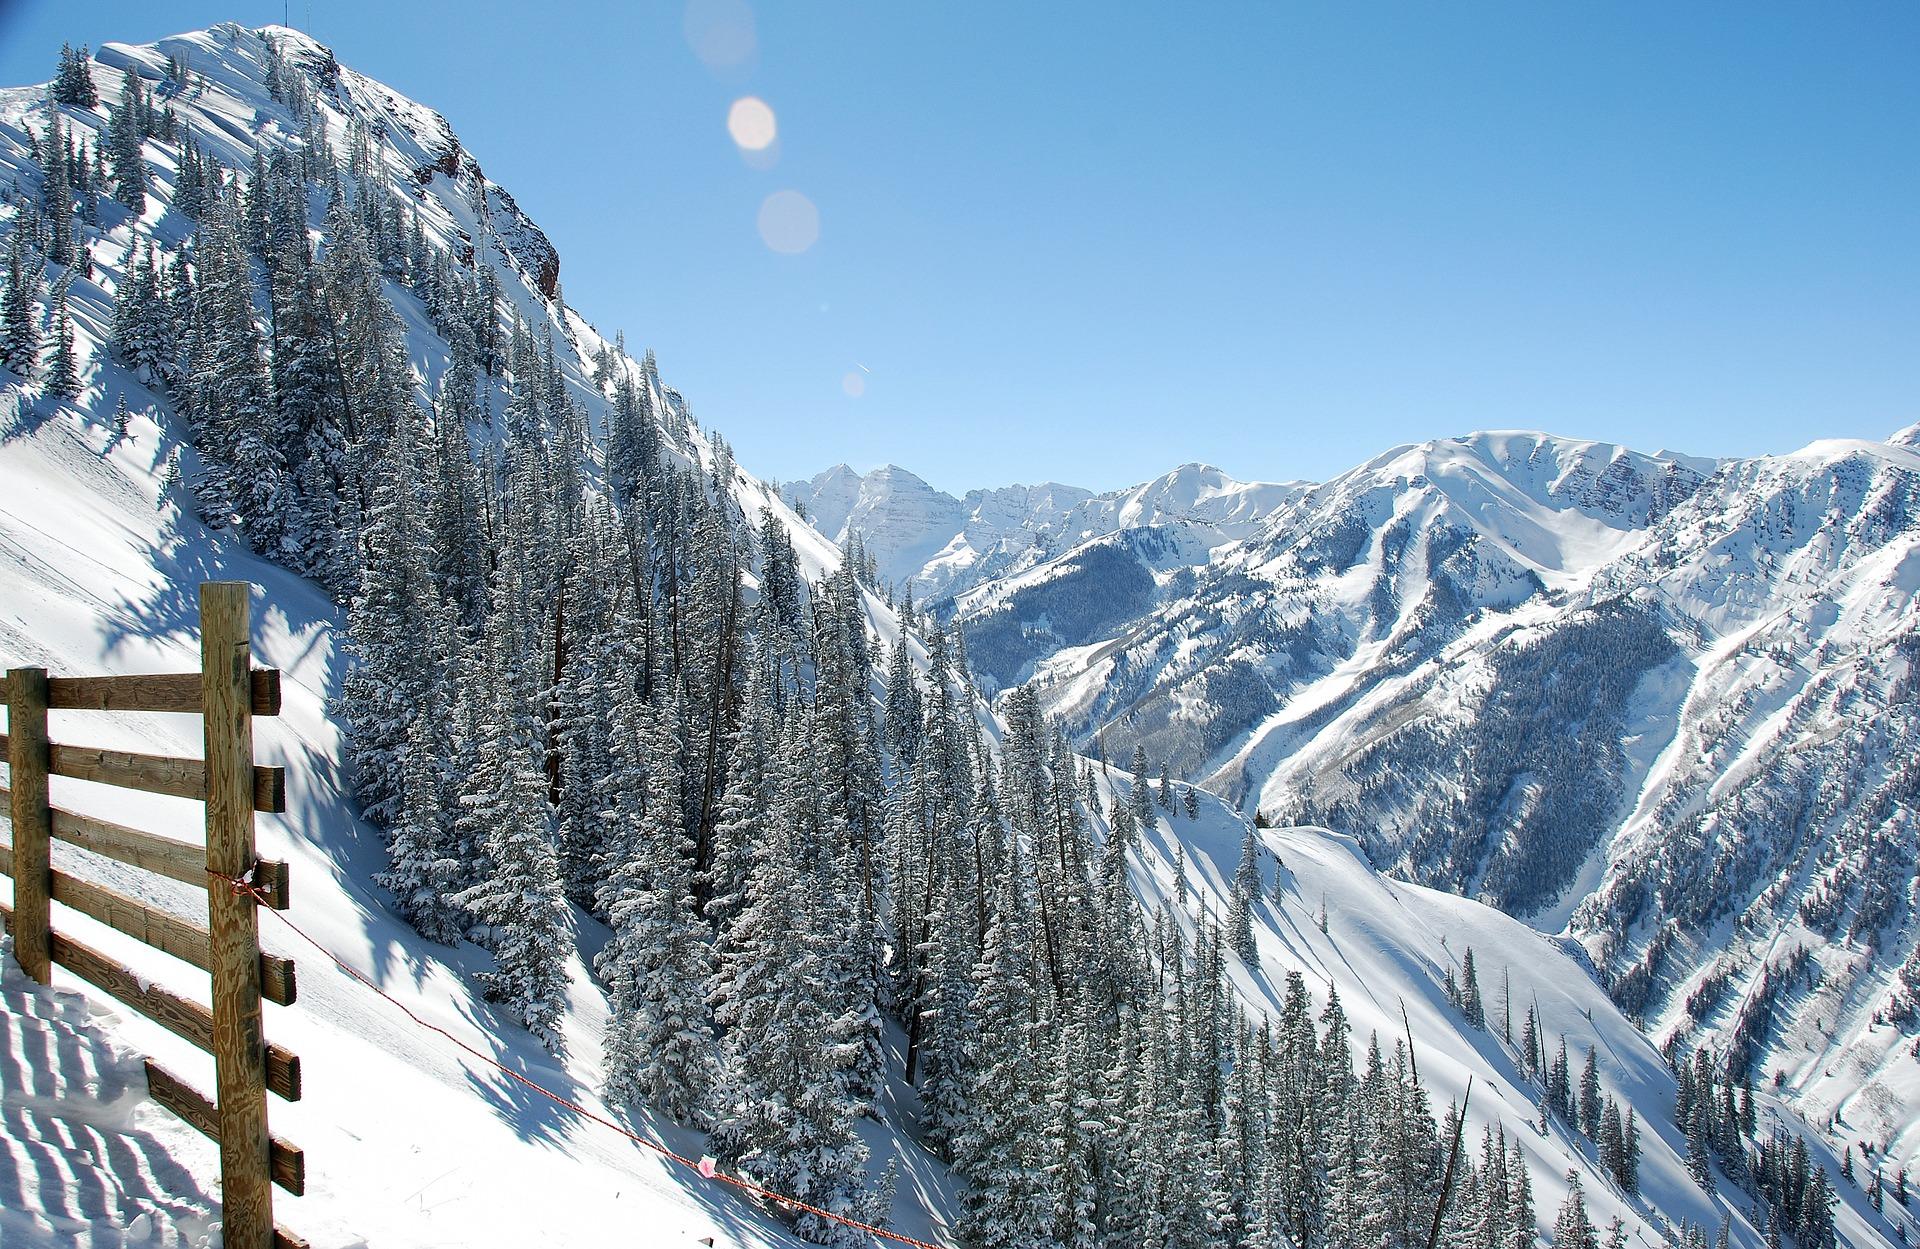 skiing in Aspen